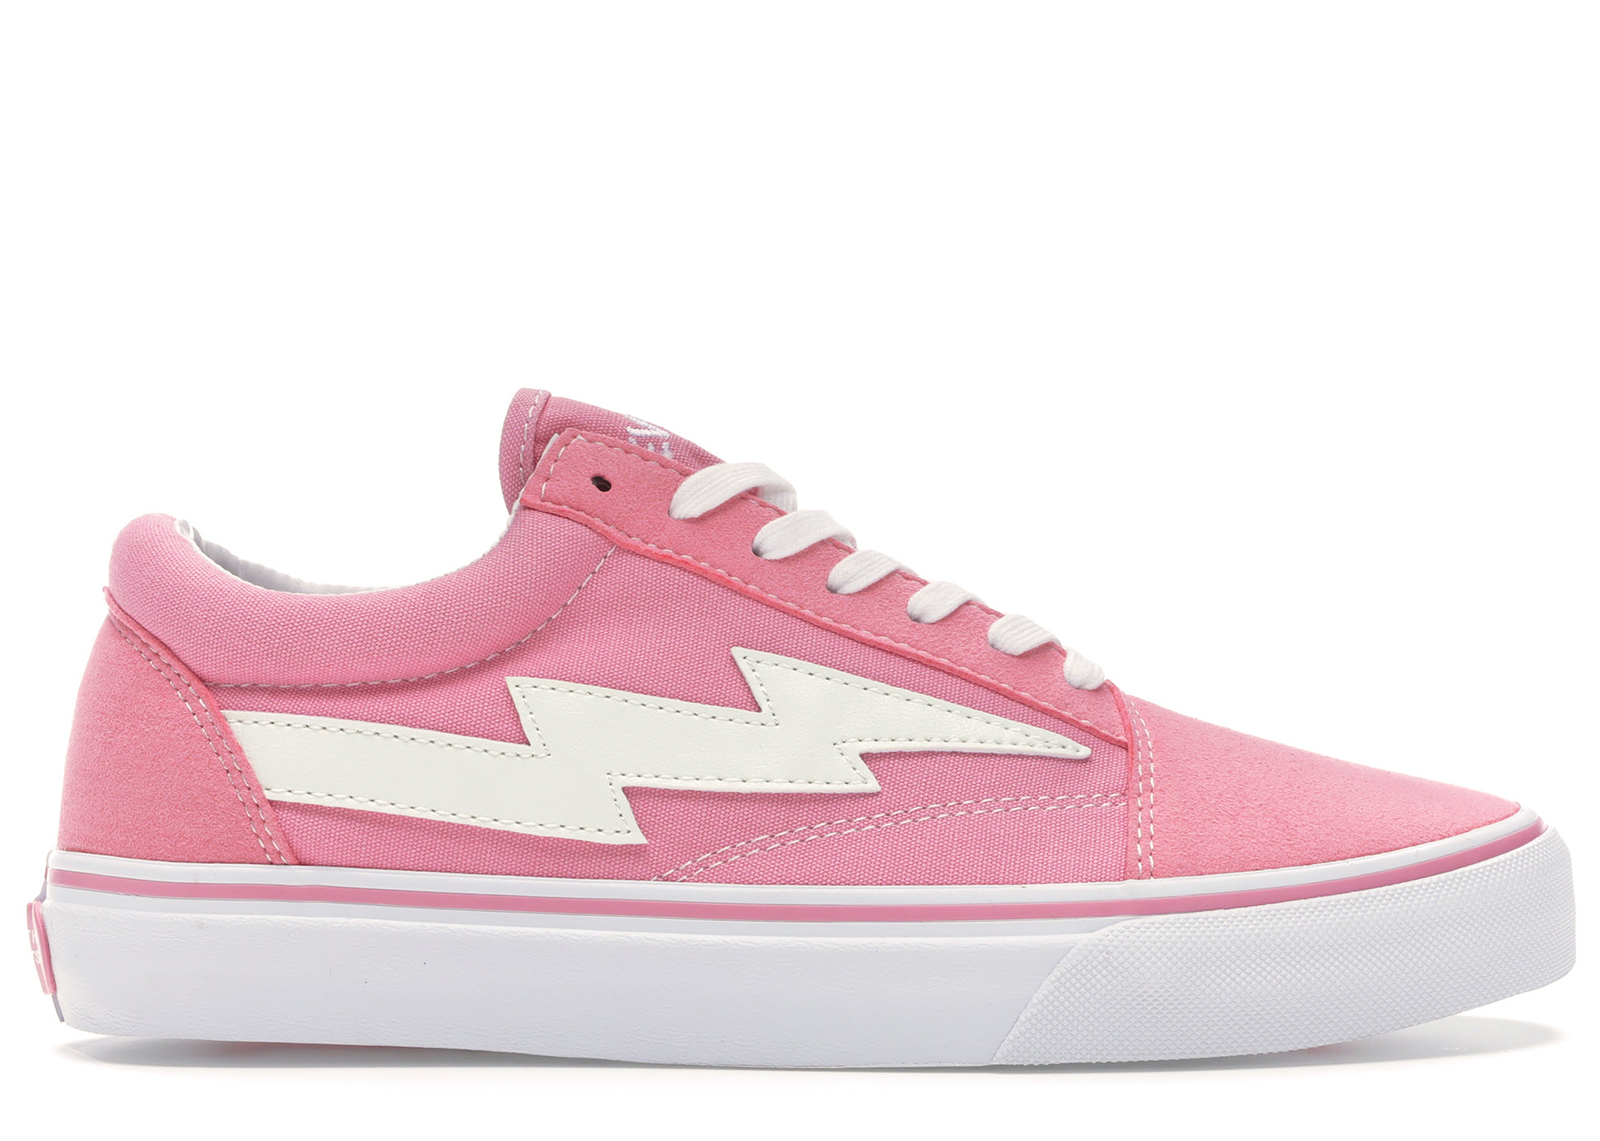 Revenge X Storm Low Pink - Sneakers